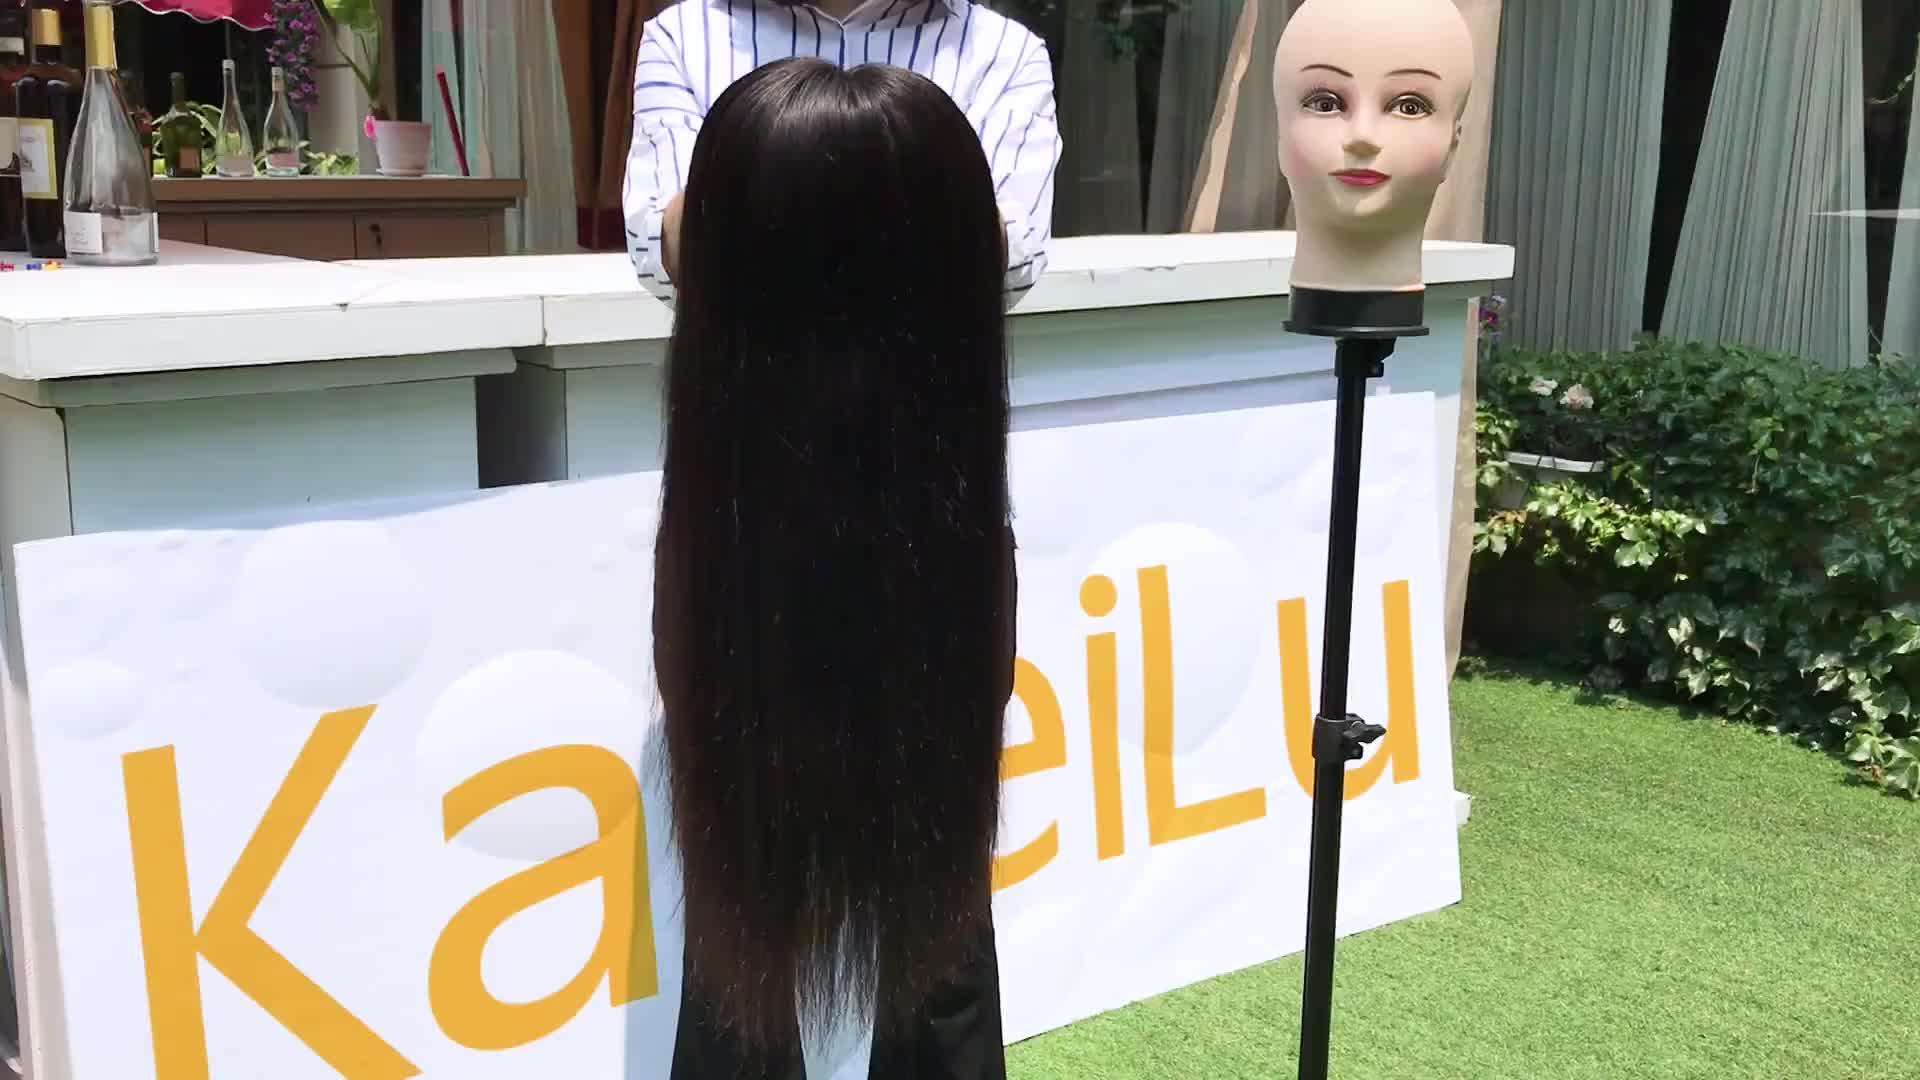 Hot sale beyonce blonde human hair lace wig,cheap overseas wig blonde,beautiful u part human hair wig blonde ponytail wig